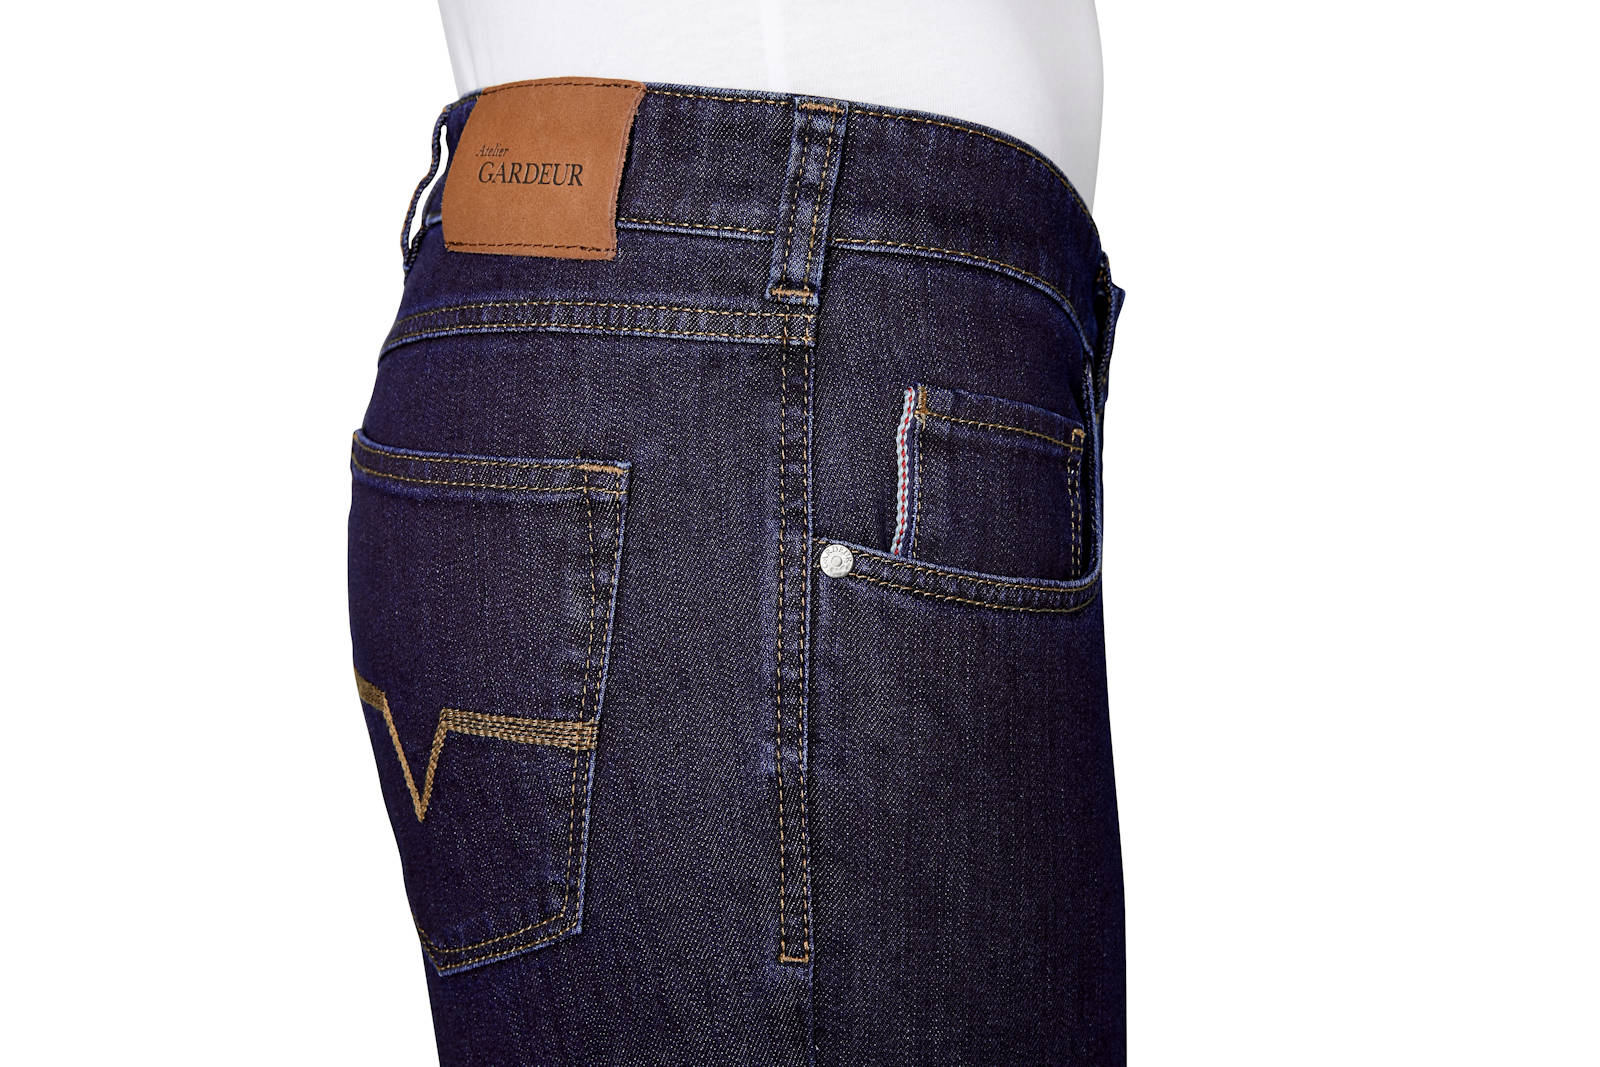 Atelier-GARDEUR-Jeans-NEVIO-11-Regular-Fit-Herren-Hose-Straight-Leg-Denim-NEU Indexbild 5